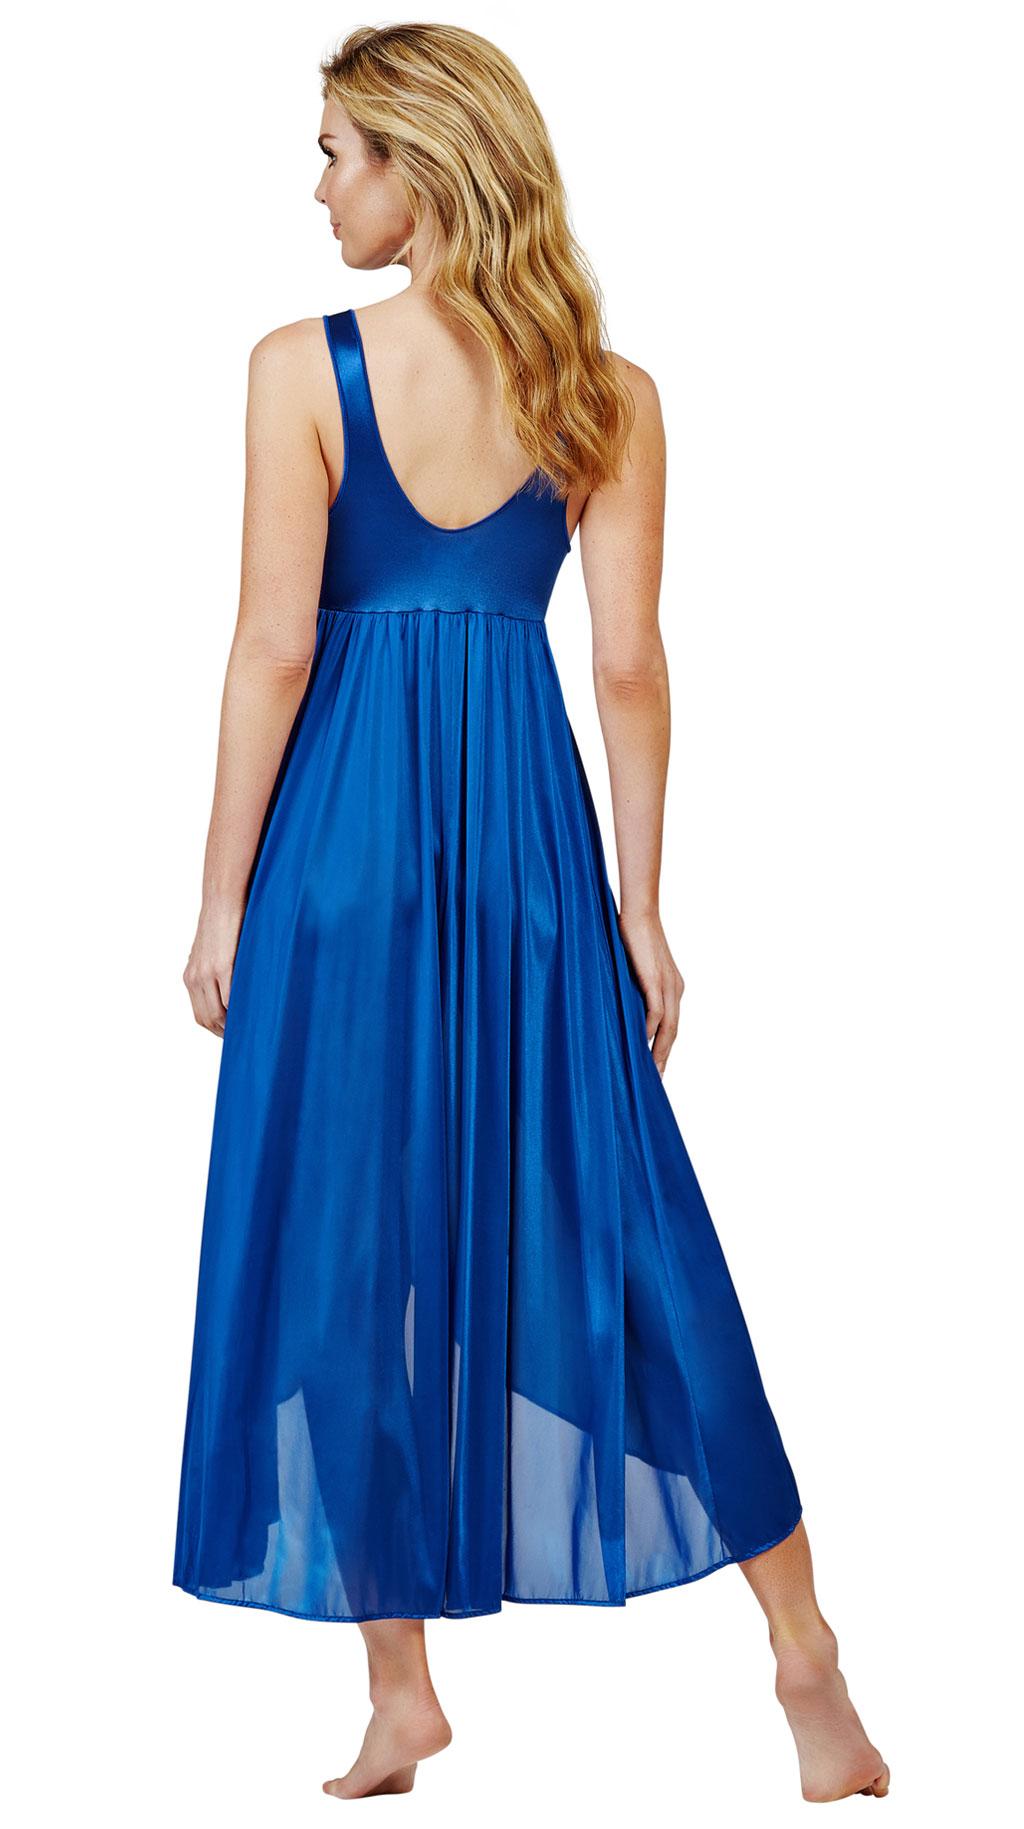 peignoir nightgowns